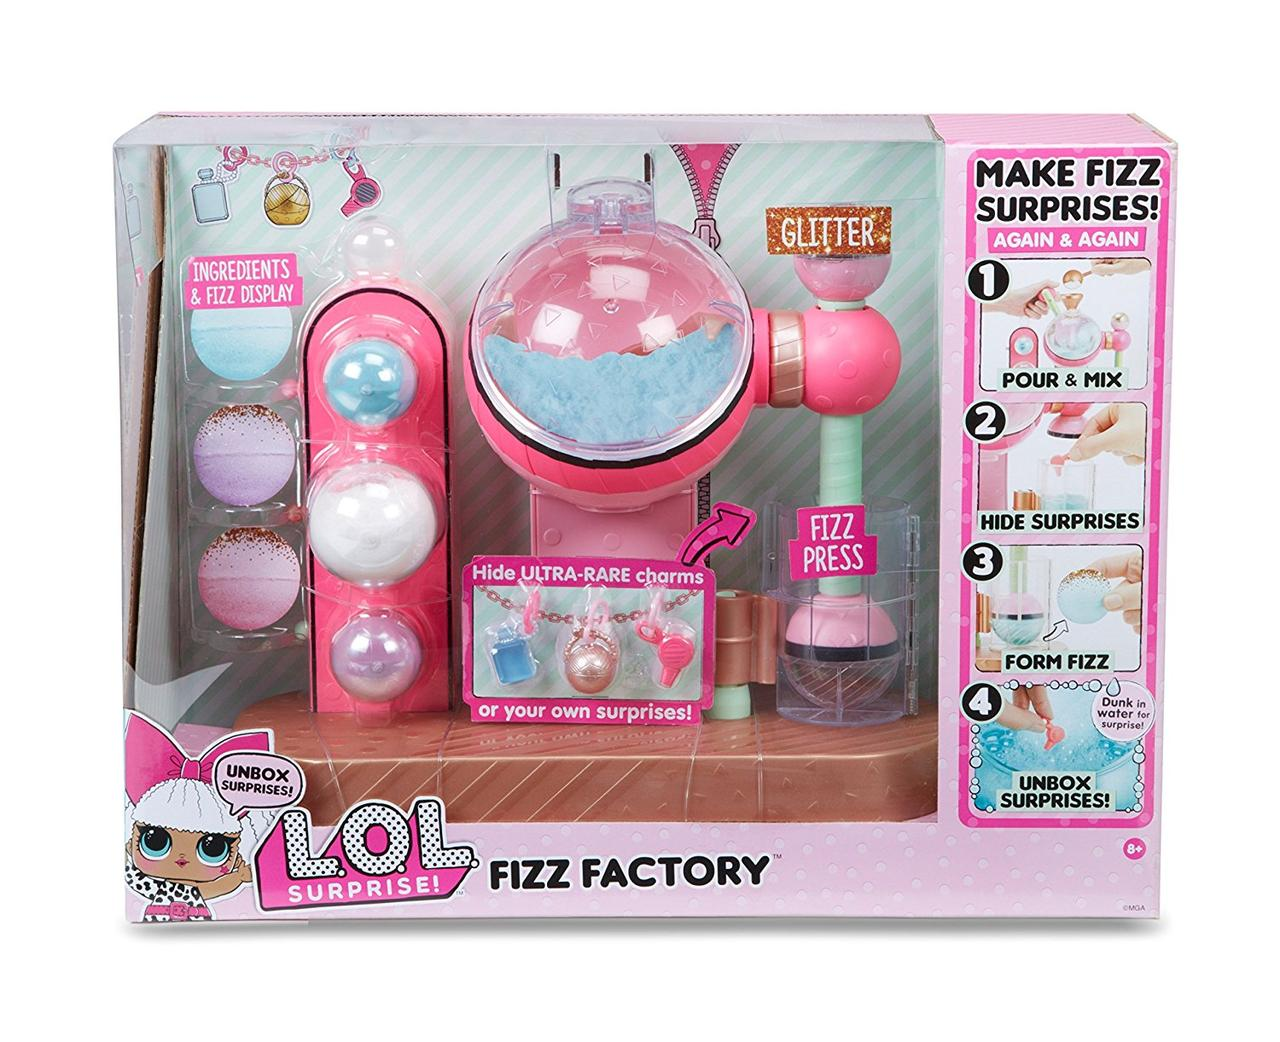 ЛОЛ сюрприз Фабрика шипучек / L.O.L. Surprise! Fizz Factory